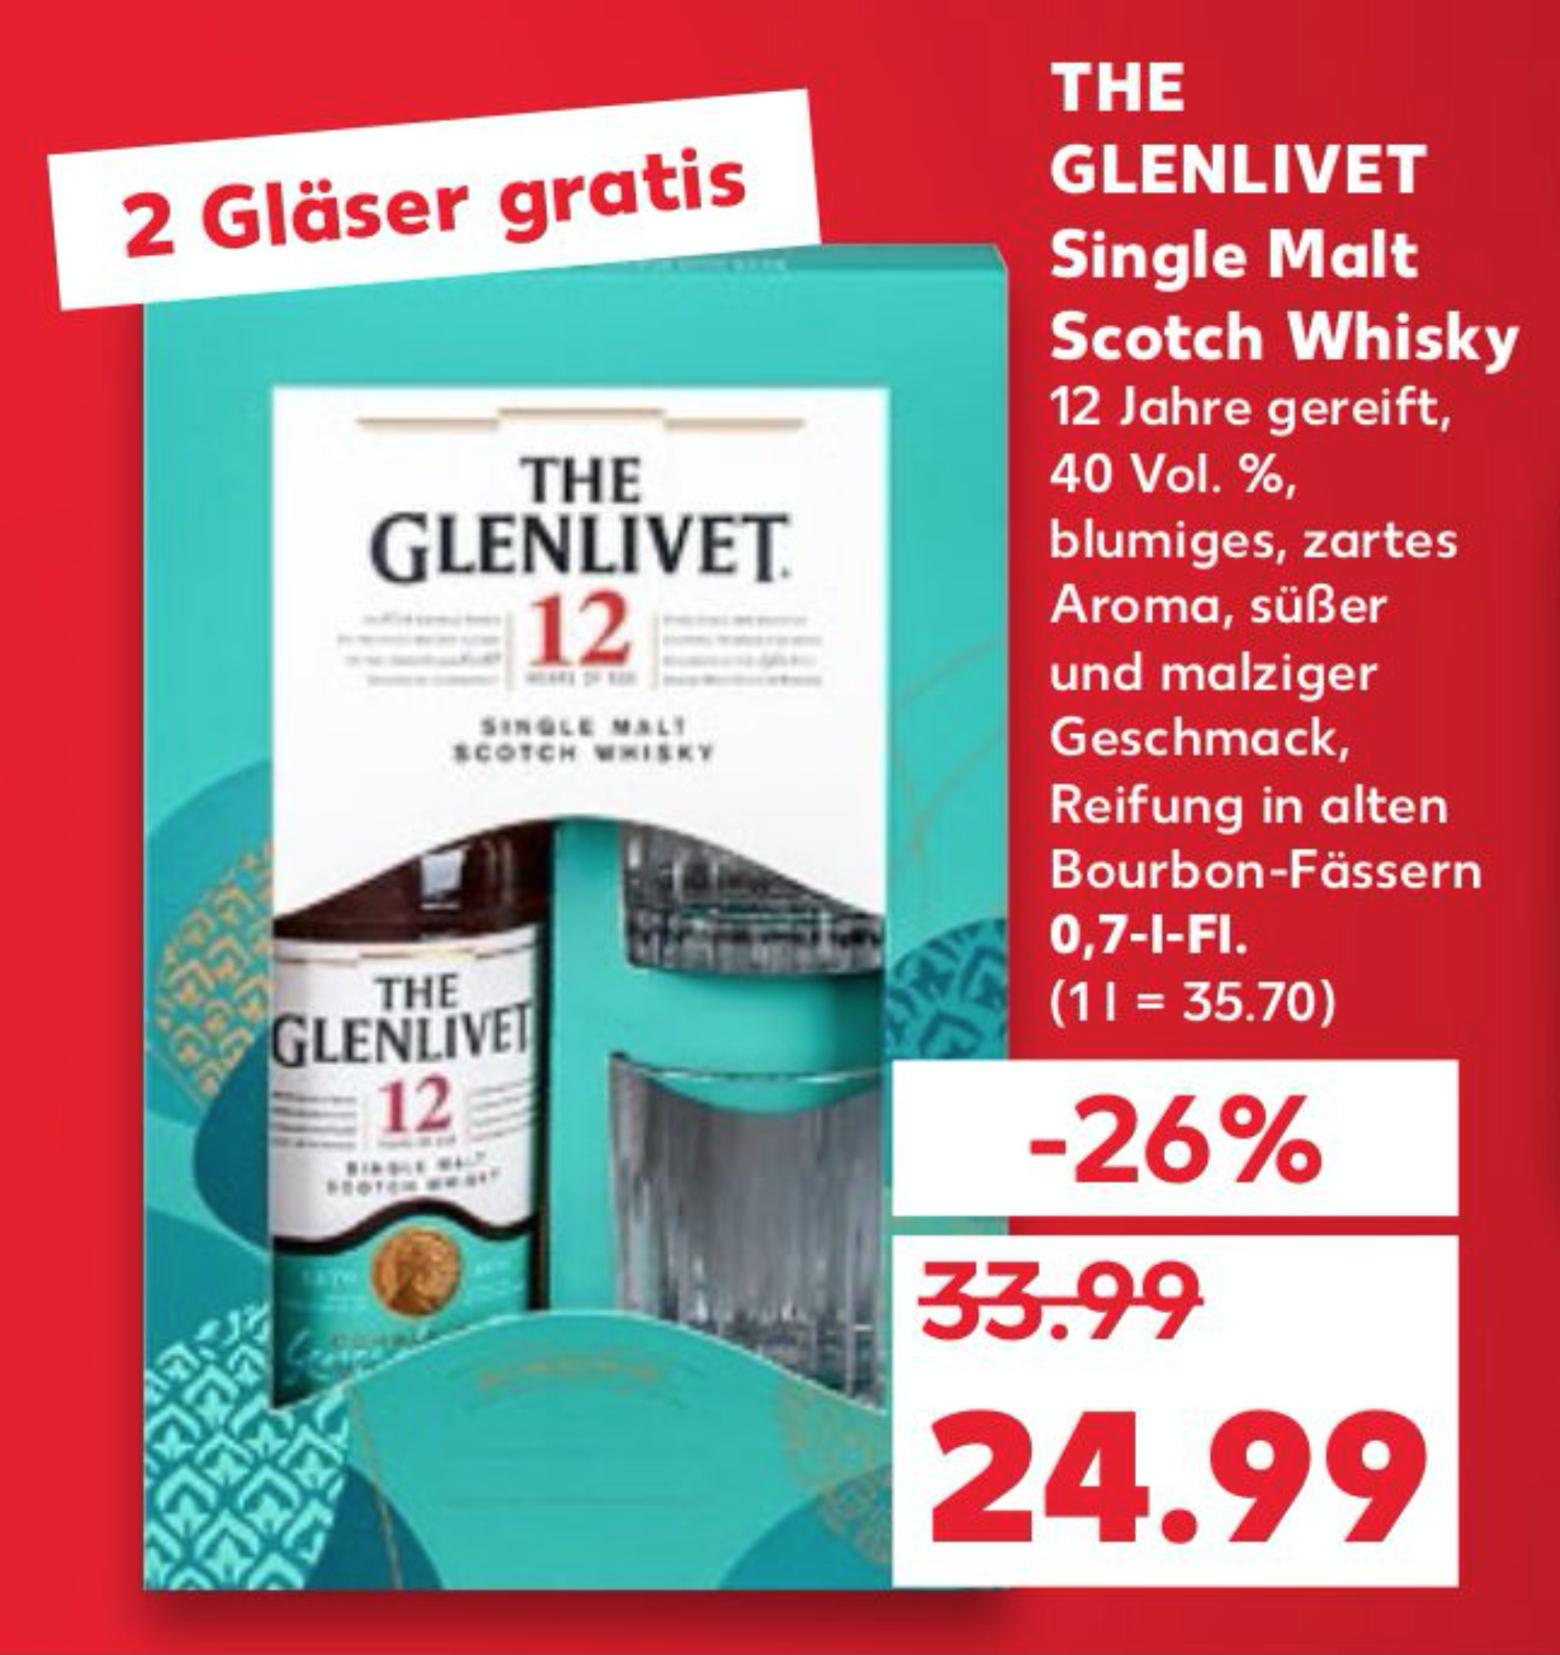 [KAUFLAND] The Glenlivet 12 Single Malt Scotch Whisky (1 x 0,7l) | MIT COUPON!